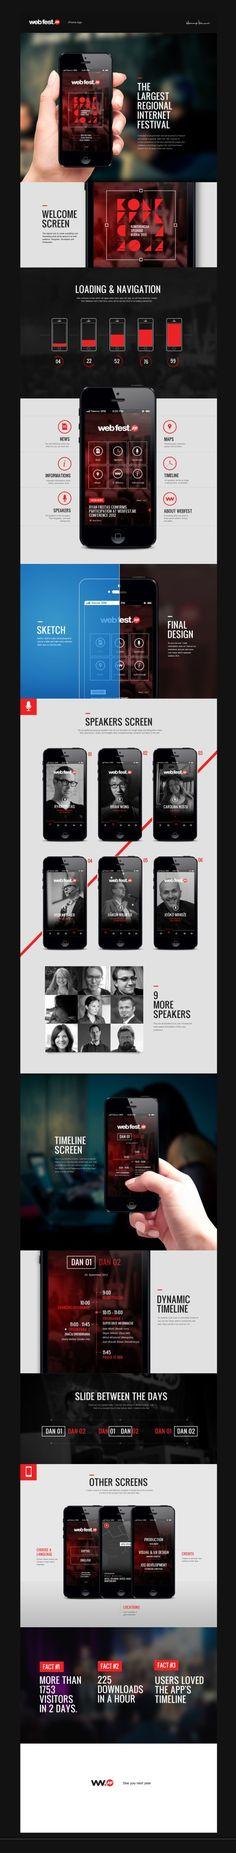 another killer mobile... WebFest - #iPhone #App by Nemanja Iv... on Twitpic